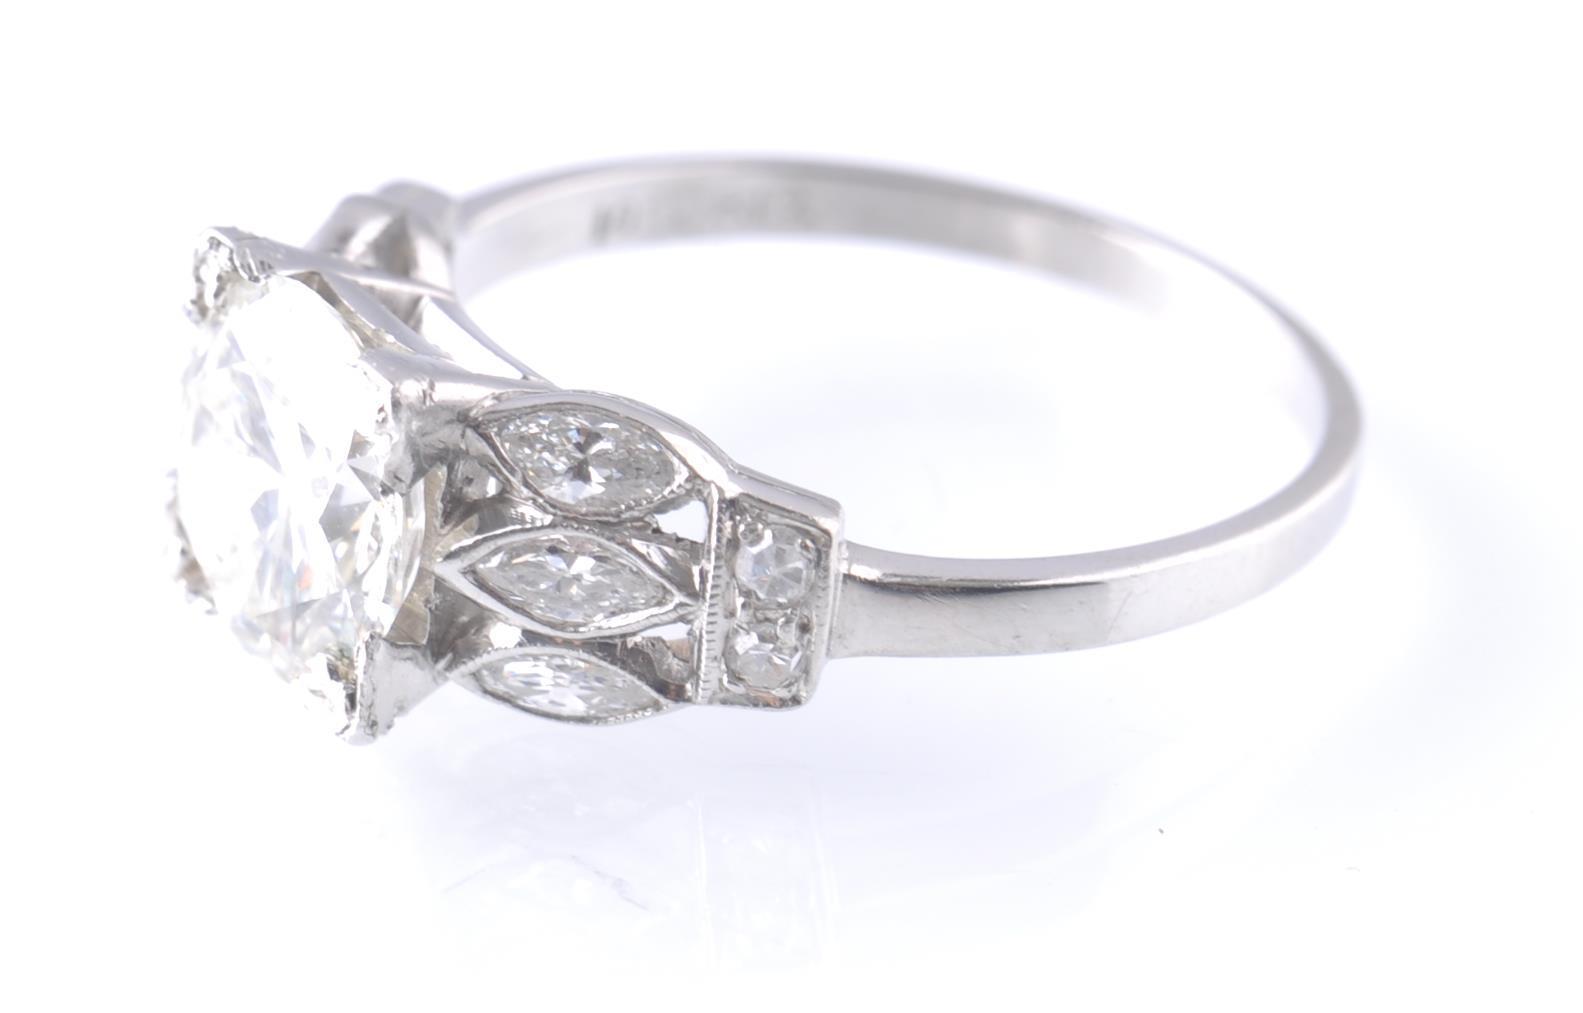 ART DECO PLATINUM AND DIAMOND SOLITAIRE 2CT RING - Image 3 of 5